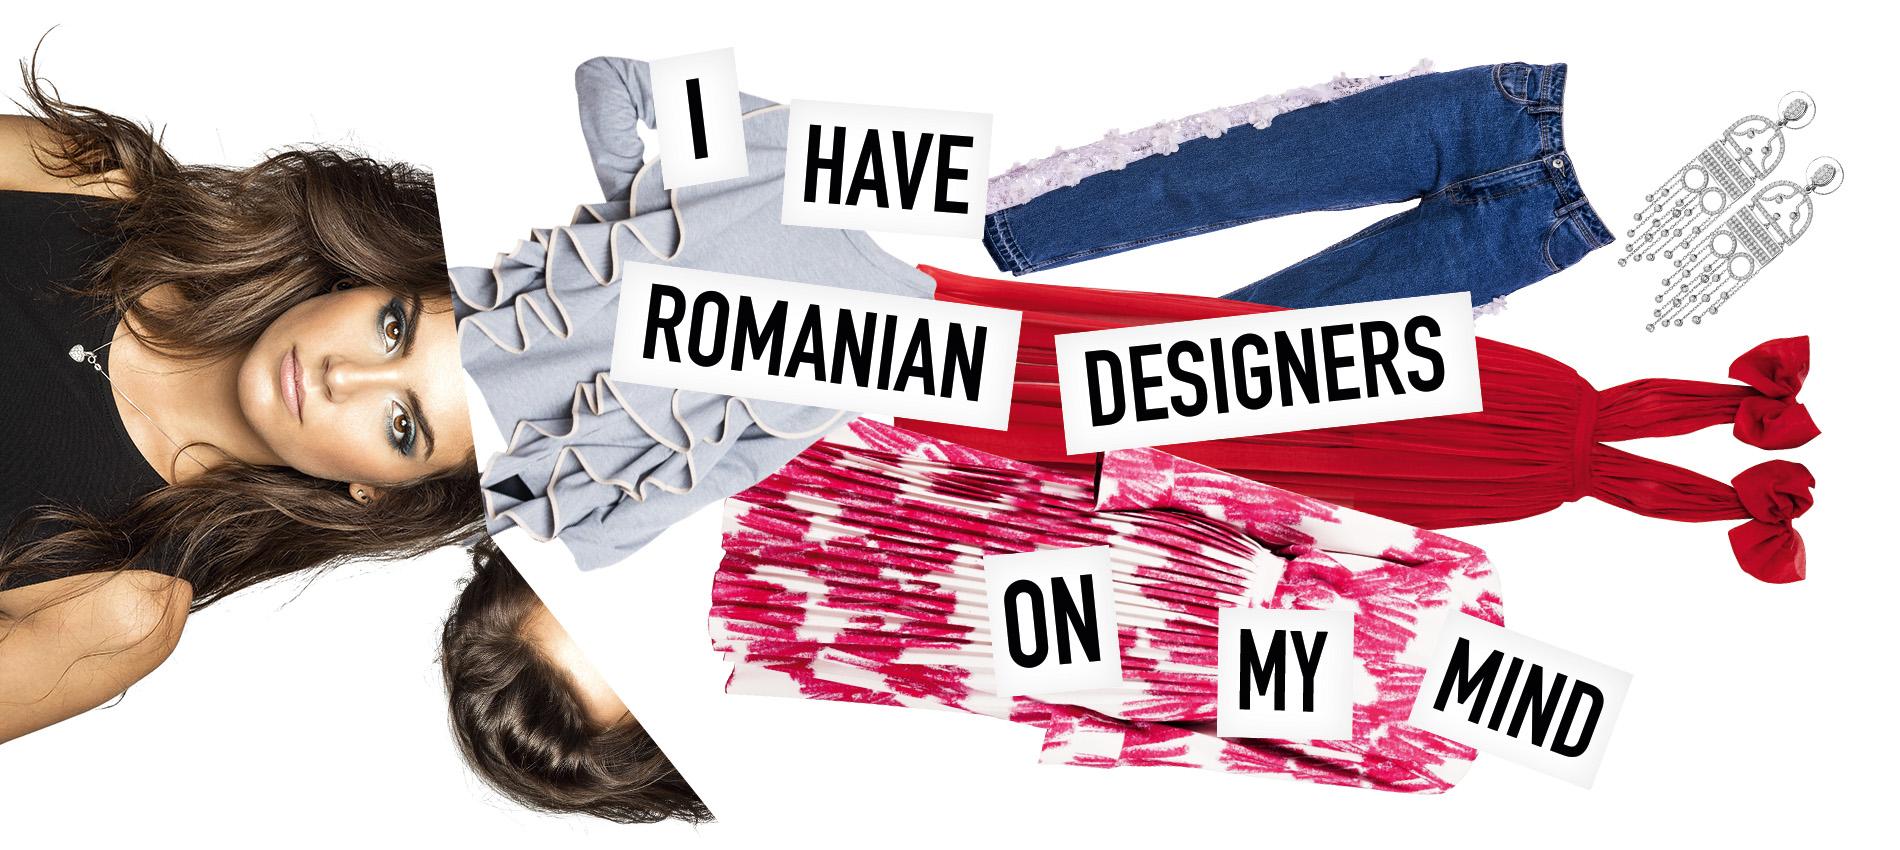 I have Romanian designers on my mind by Molecule-F și Mall Promenada